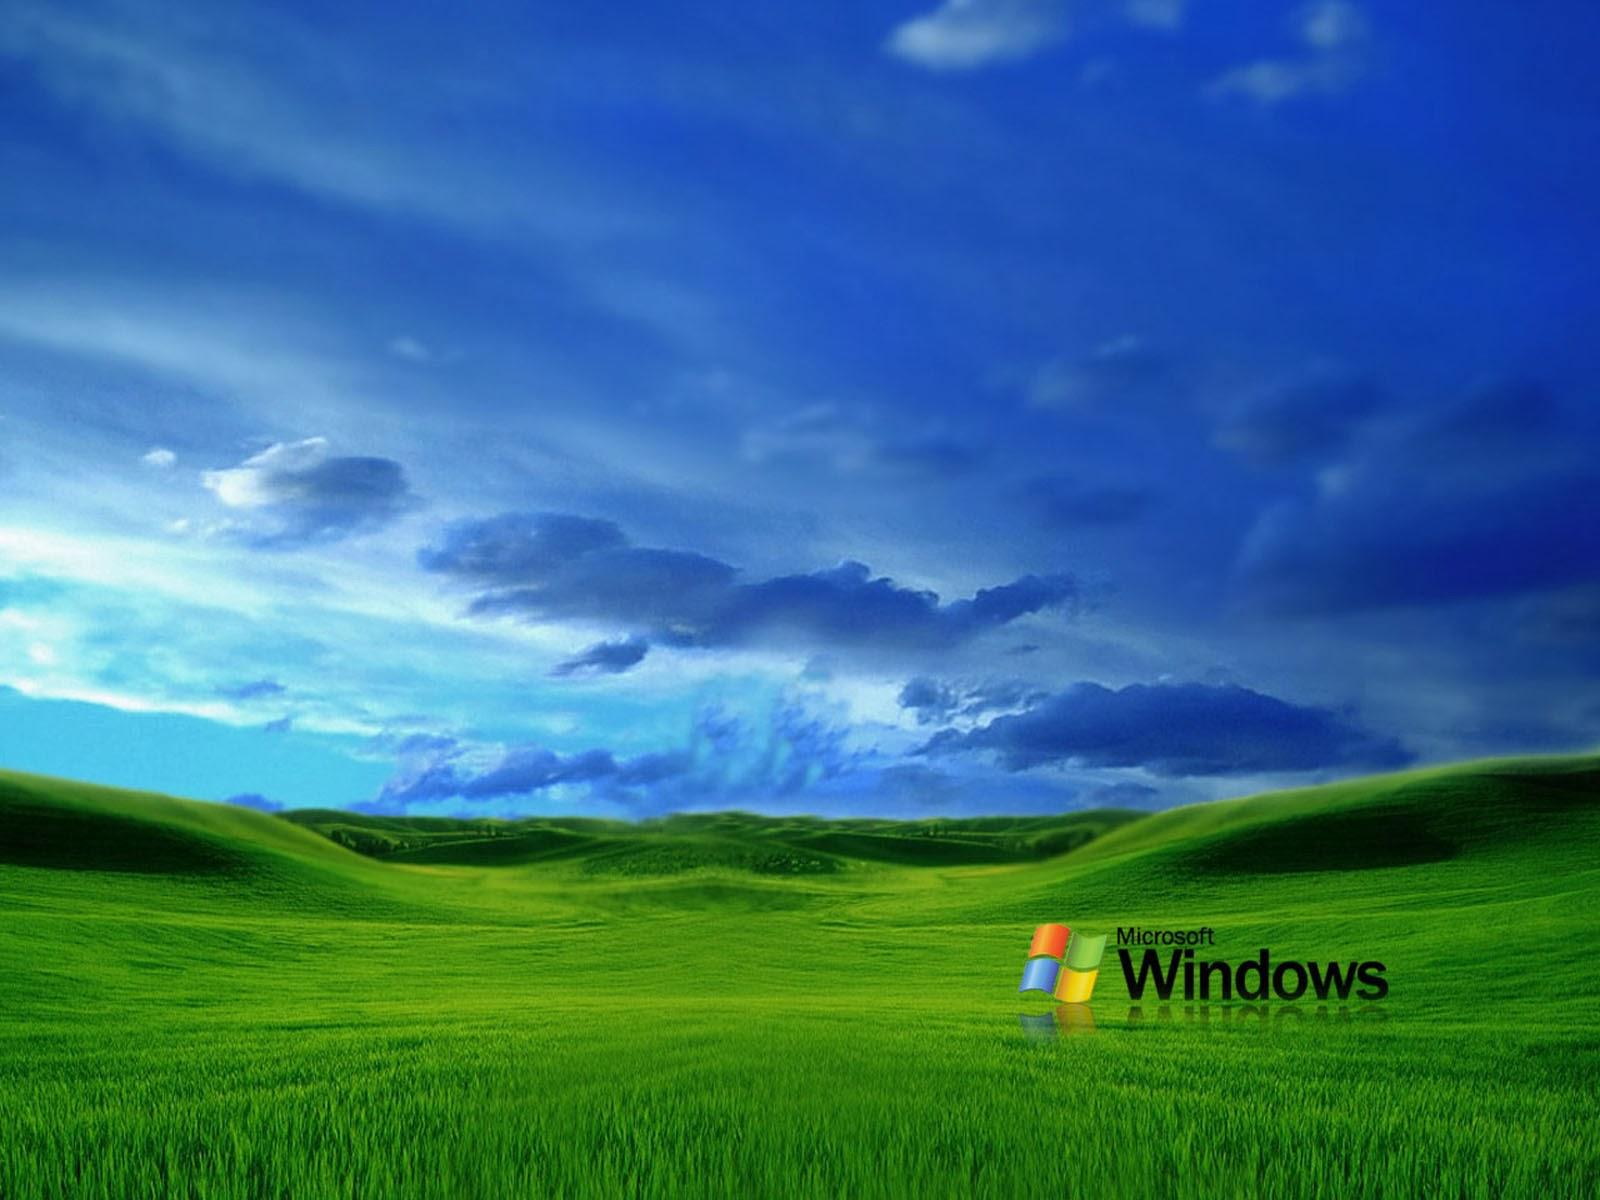 wallpapers: Windows Vista Bliss Wallpapers